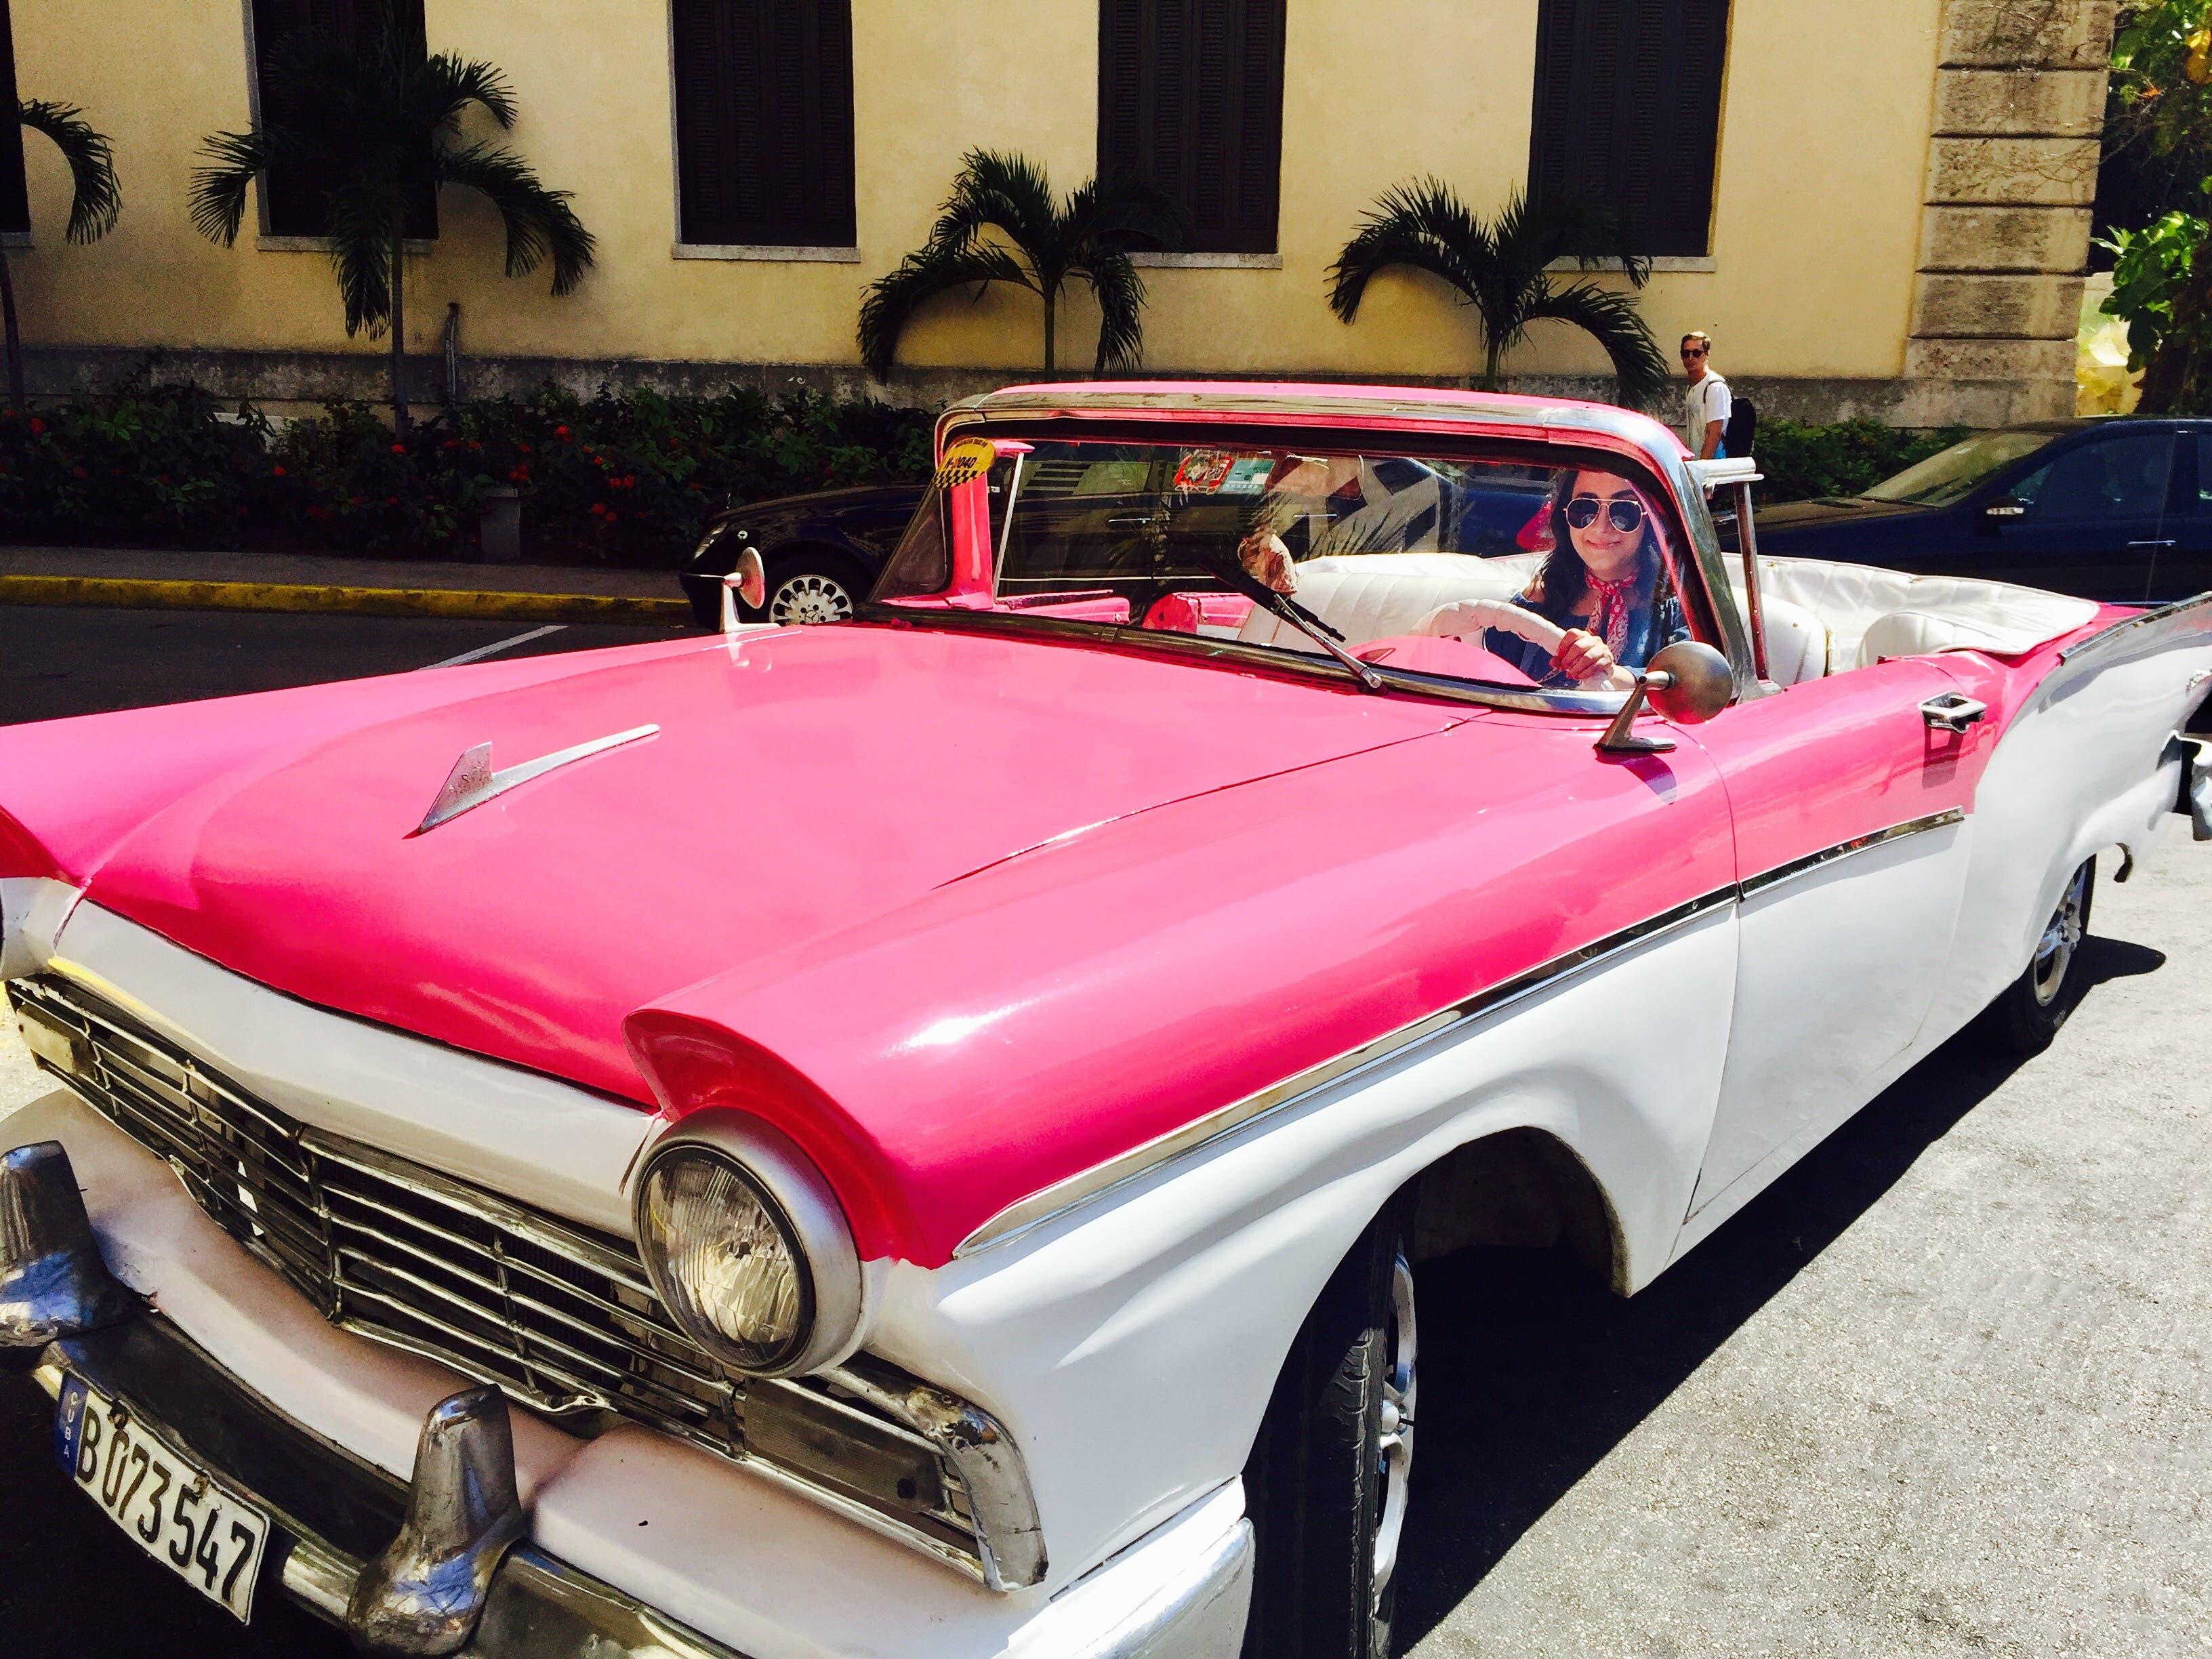 Retro cars zoom down the streets in Havana.